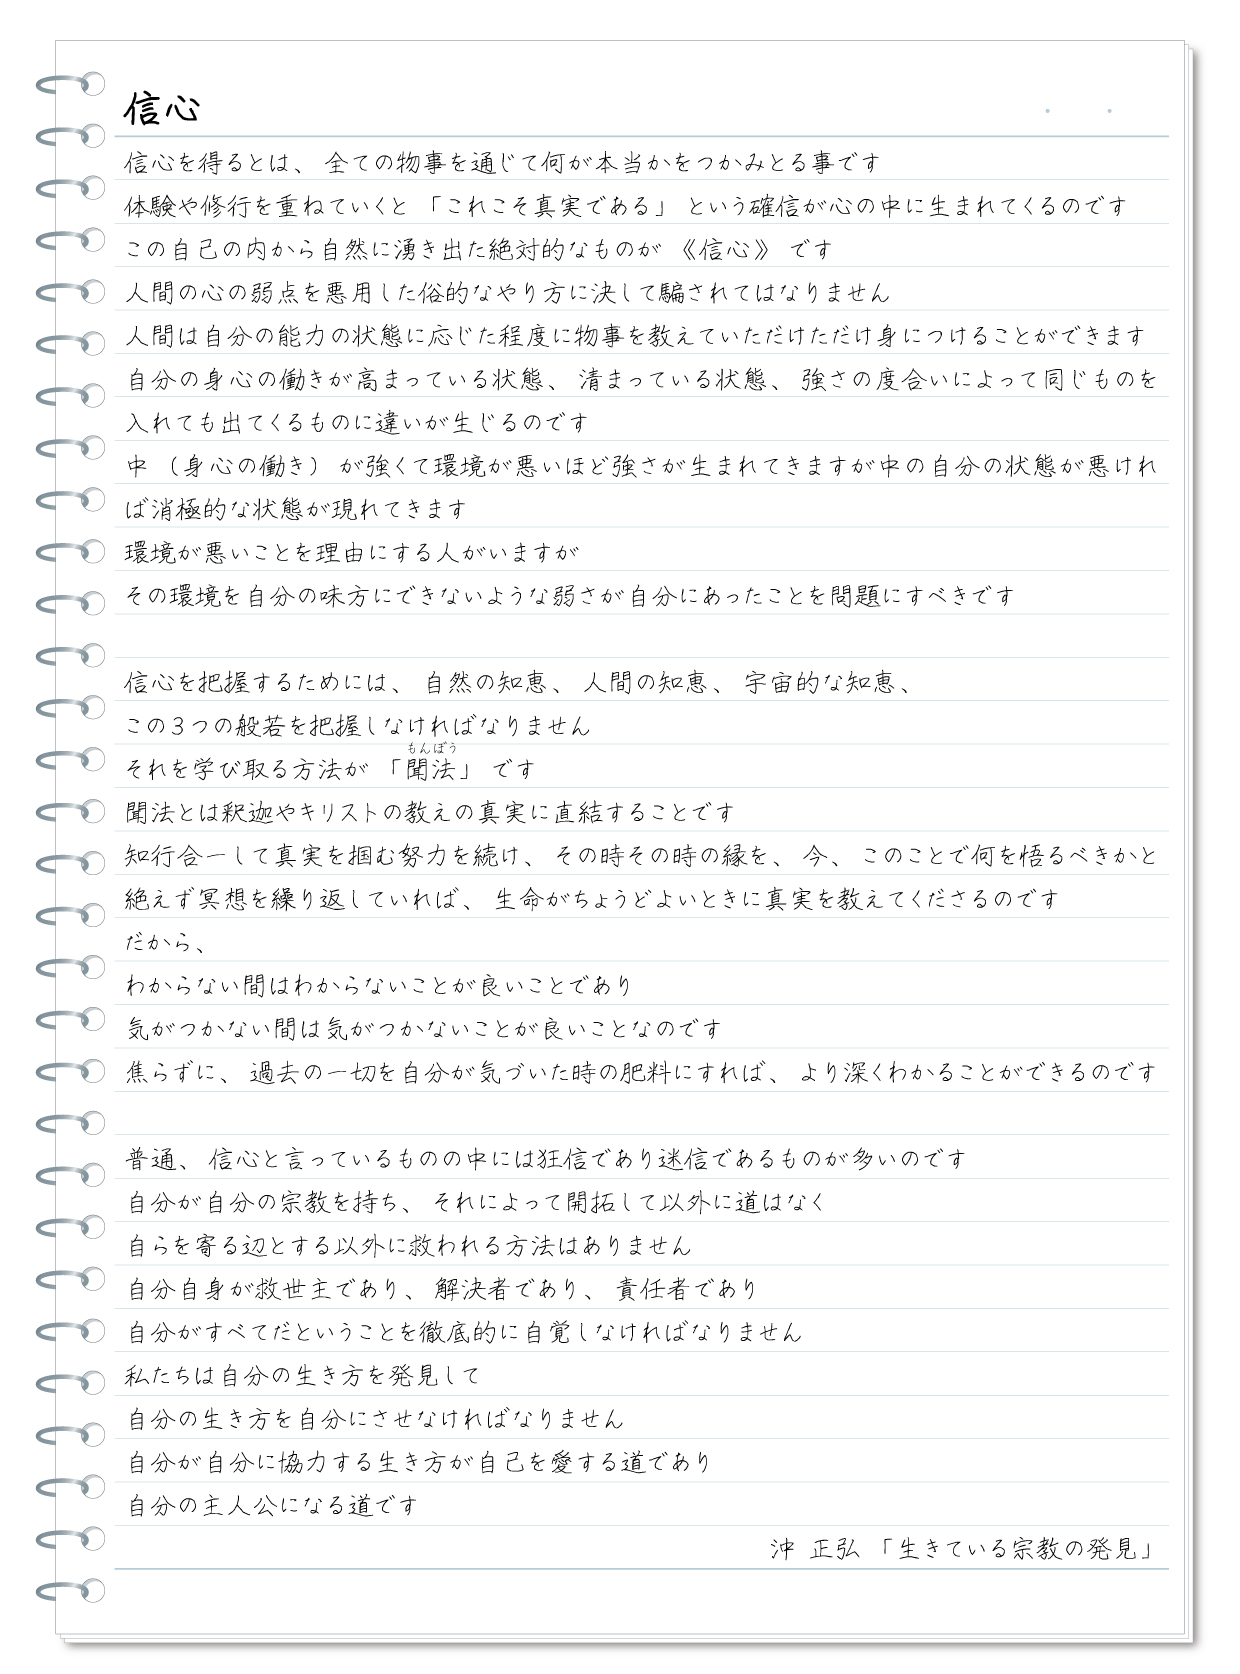 shin_note